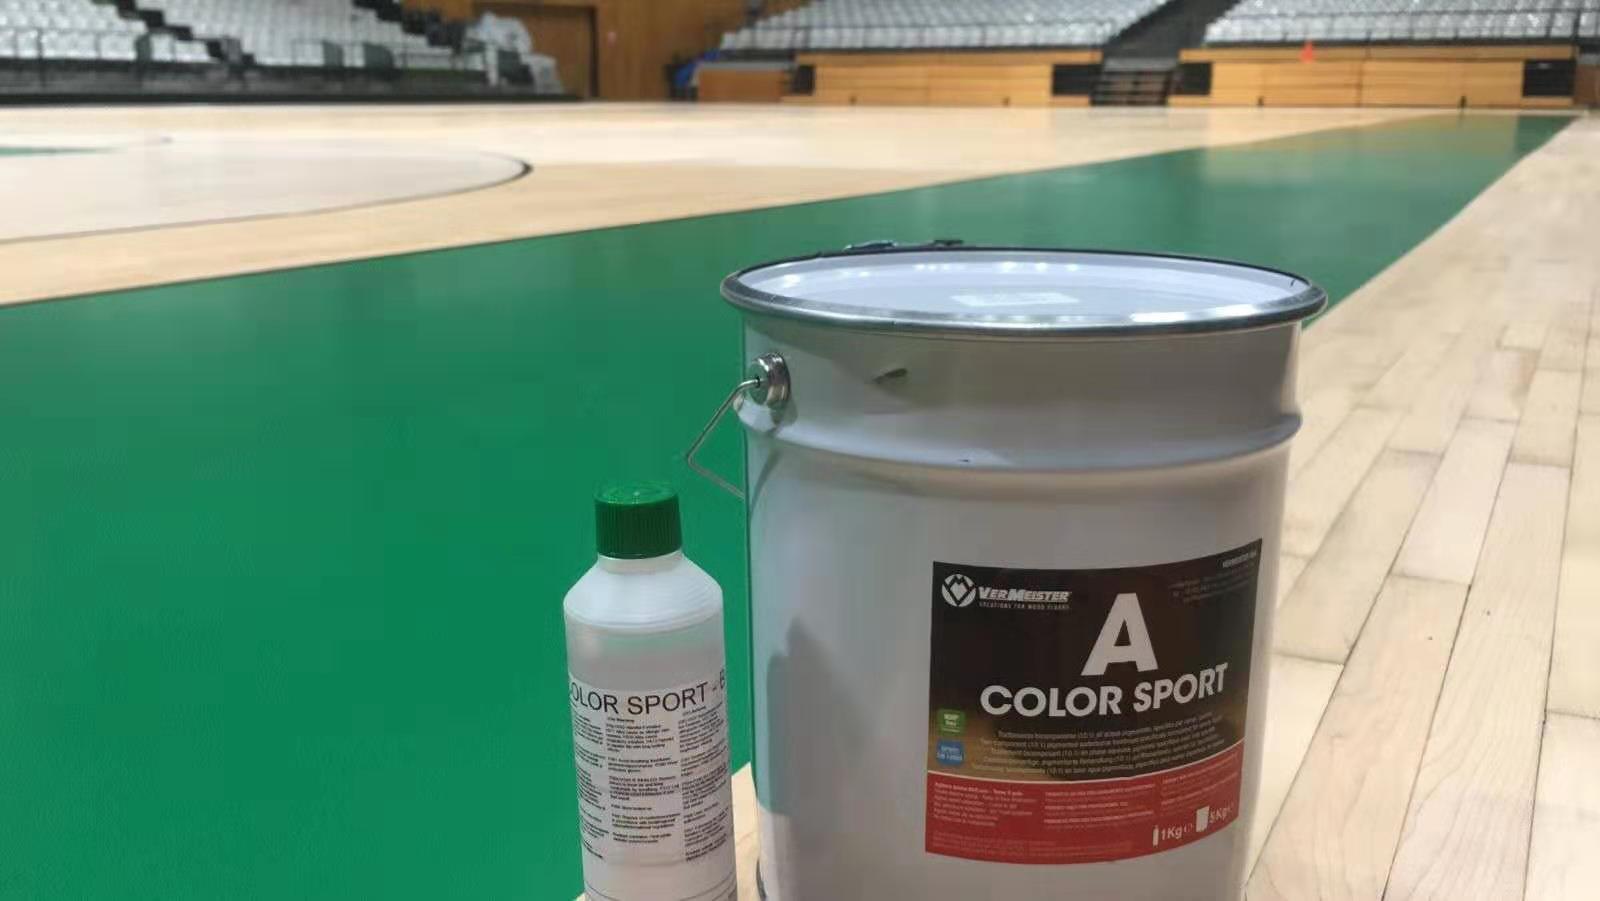 NBA賽事級別球館翻新案例---采用意大利Vermeister體育水性漆系統,國際籃聯FIBA認證